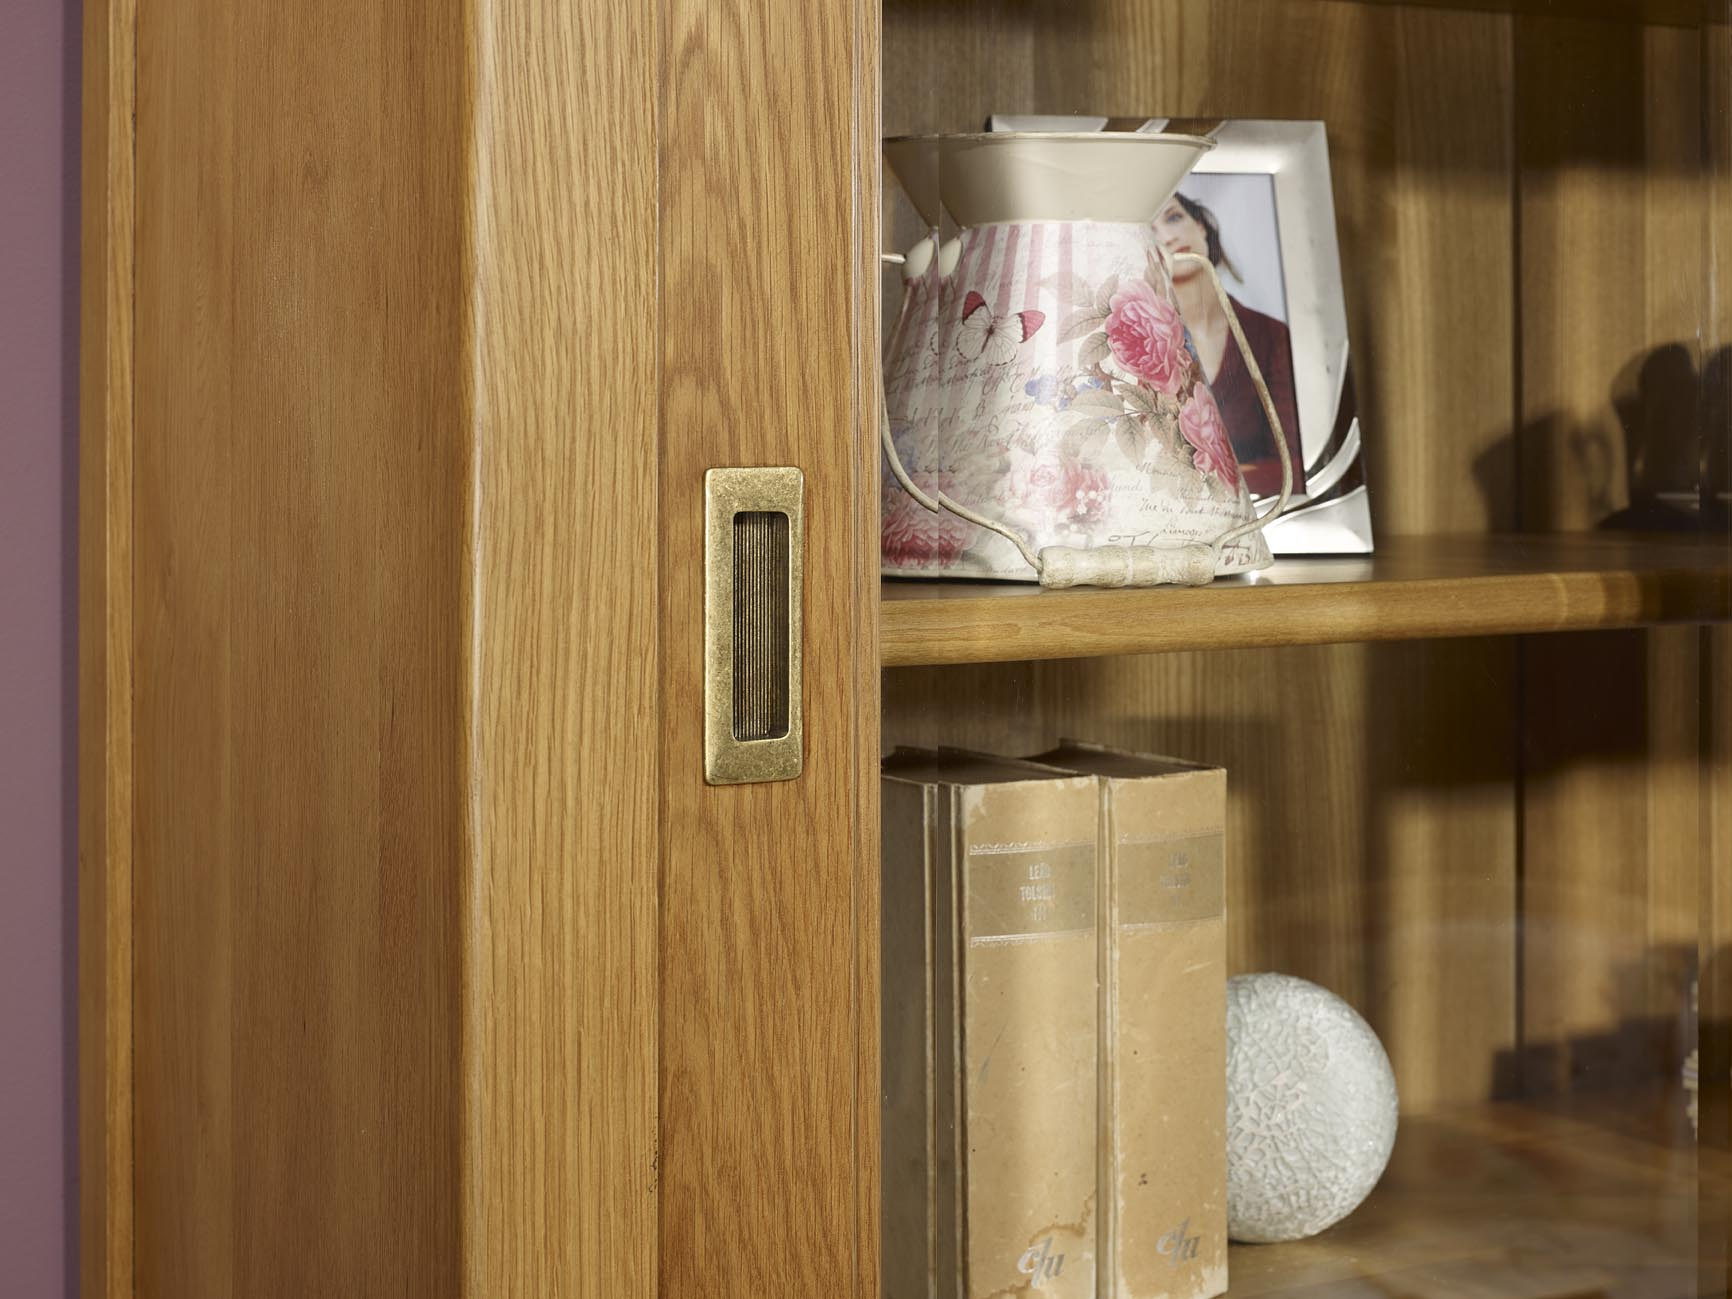 petit biblioth que henry 2 corps 2 portes en ch ne massif. Black Bedroom Furniture Sets. Home Design Ideas